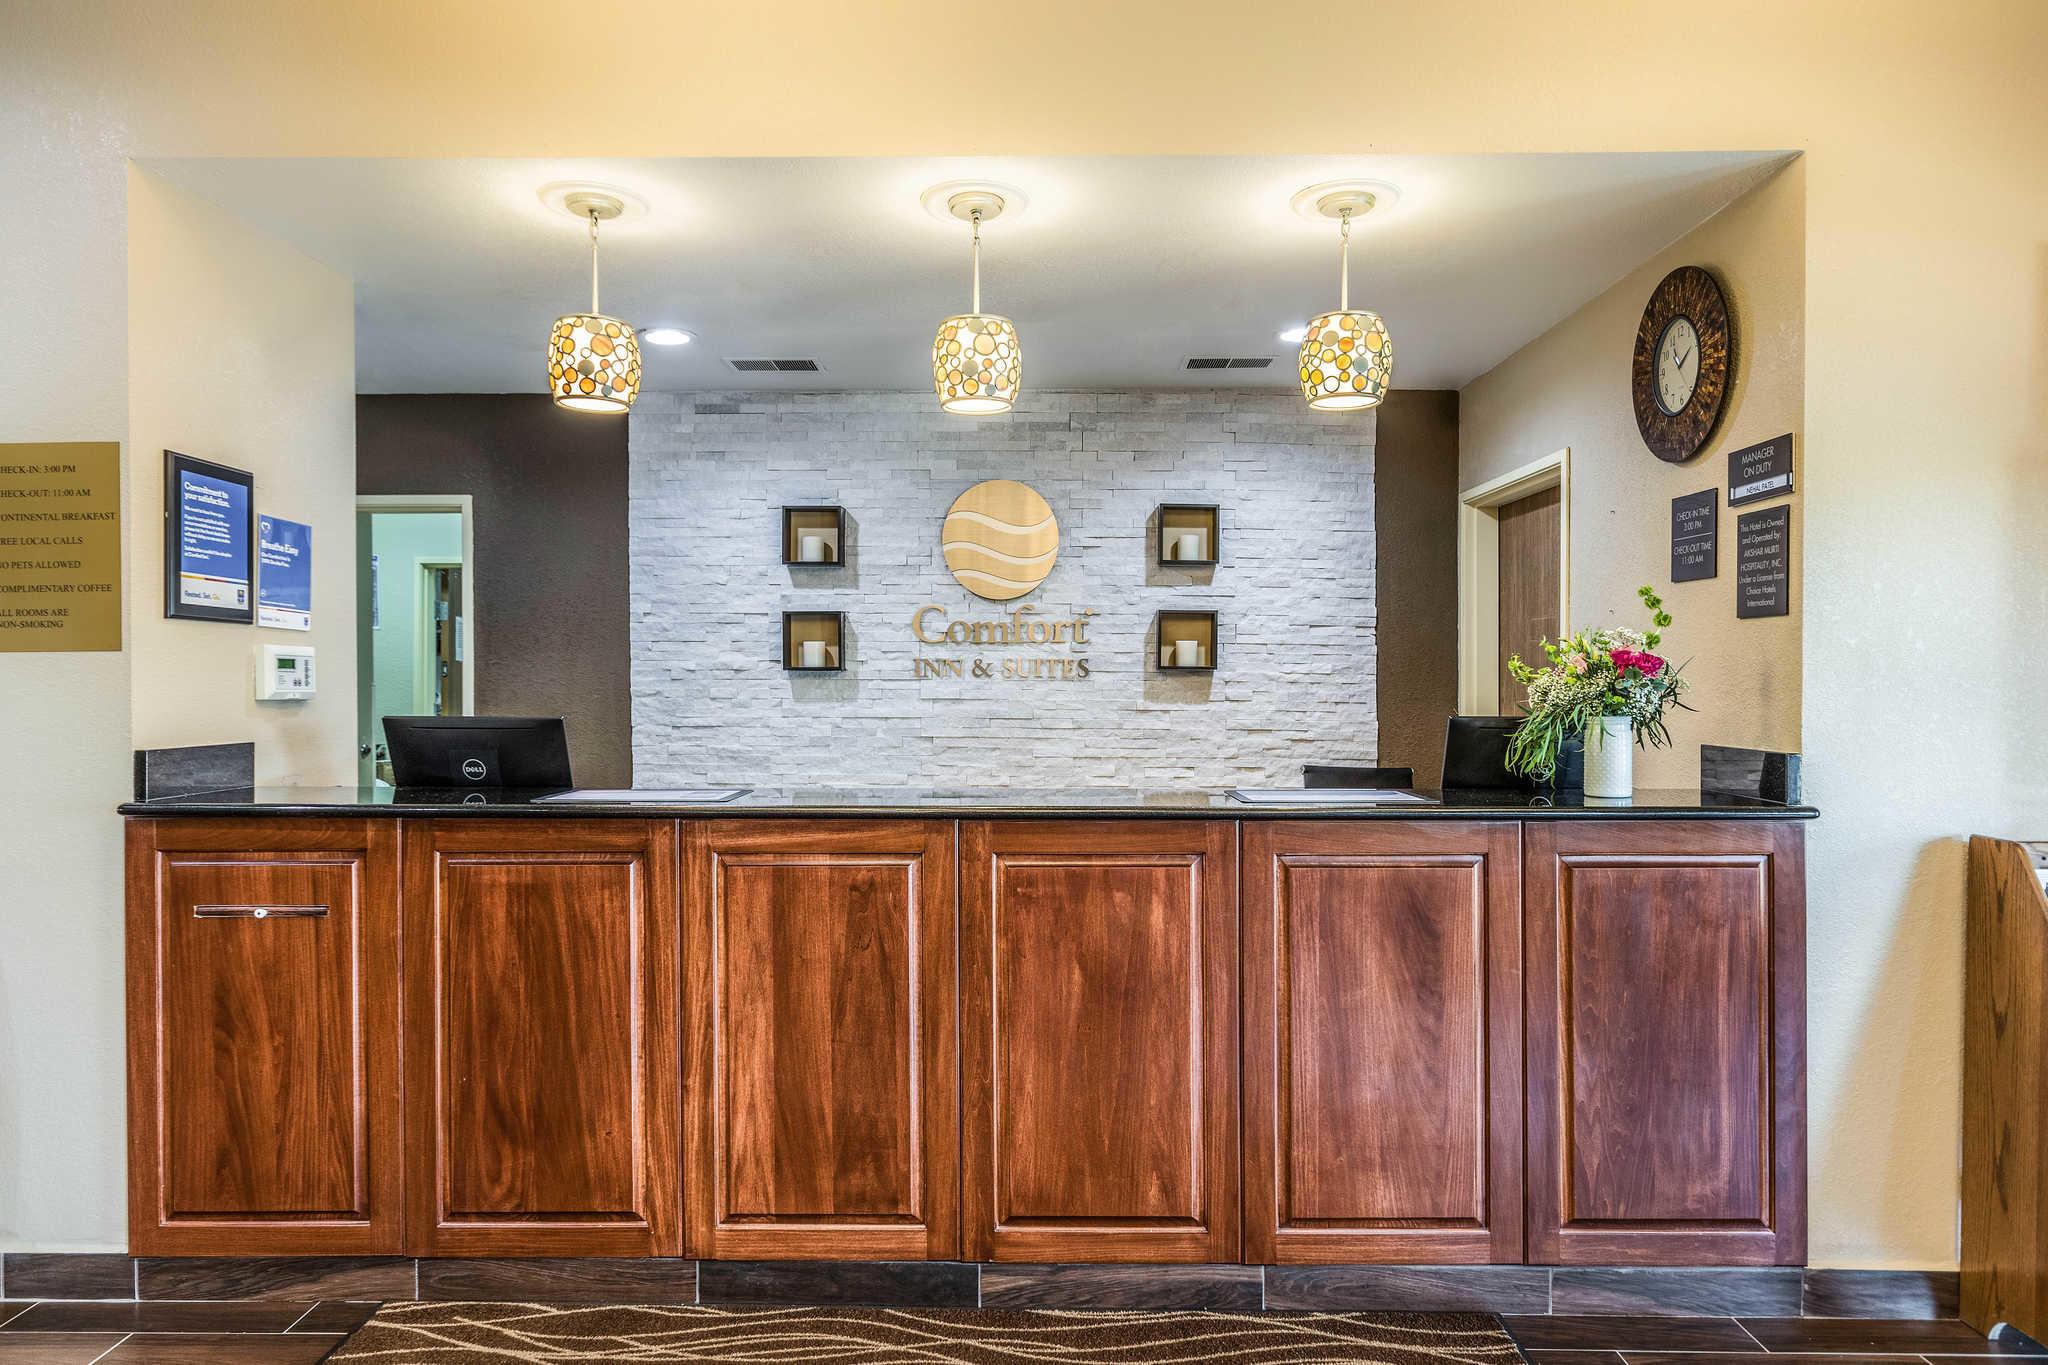 Comfort Inn & Suites North Aurora - Naperville image 6